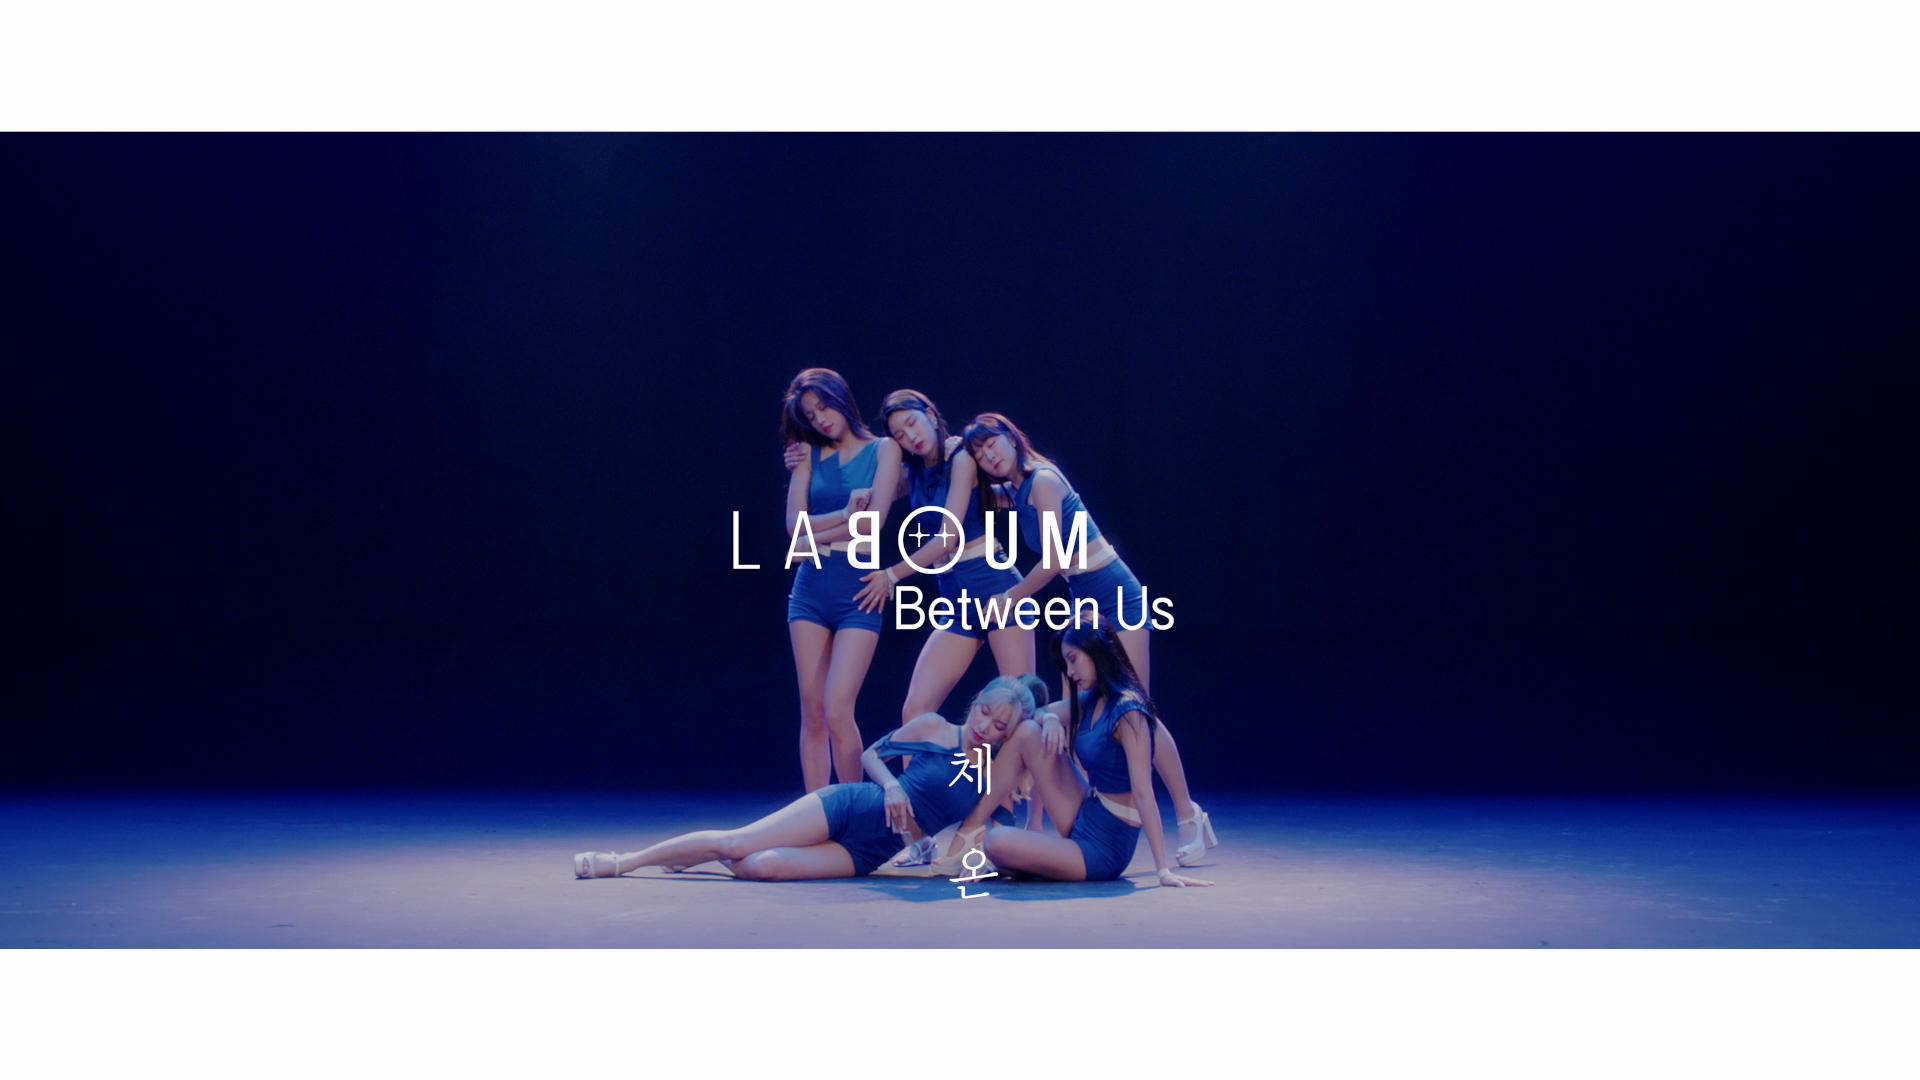 LABOUM(라붐) - '체온(Between Us)' Official M/V